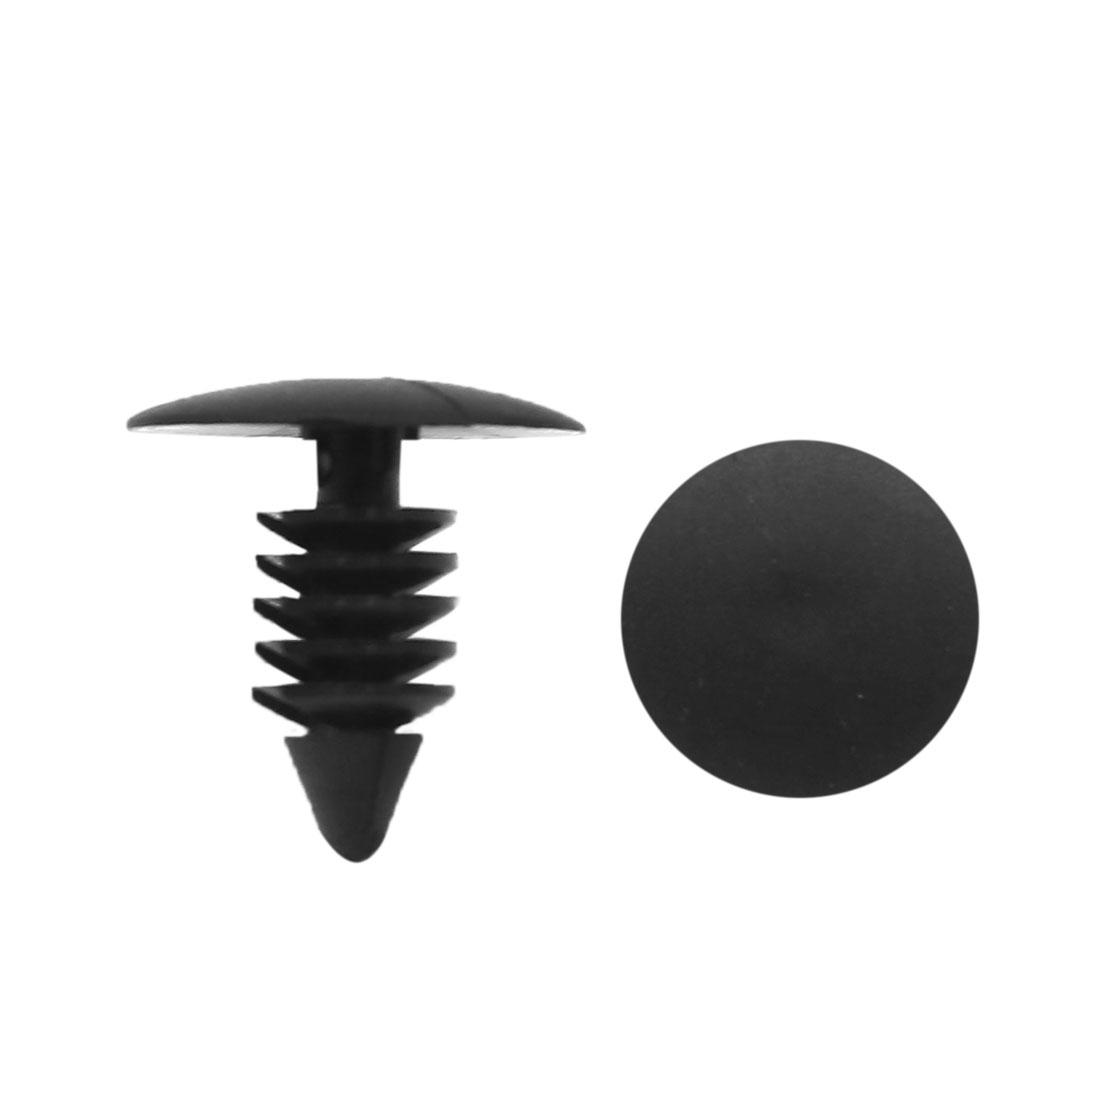 20 Pcs 8mm Hole 18mm Head Black Plastic Push Rivets Fasteners for Automobile